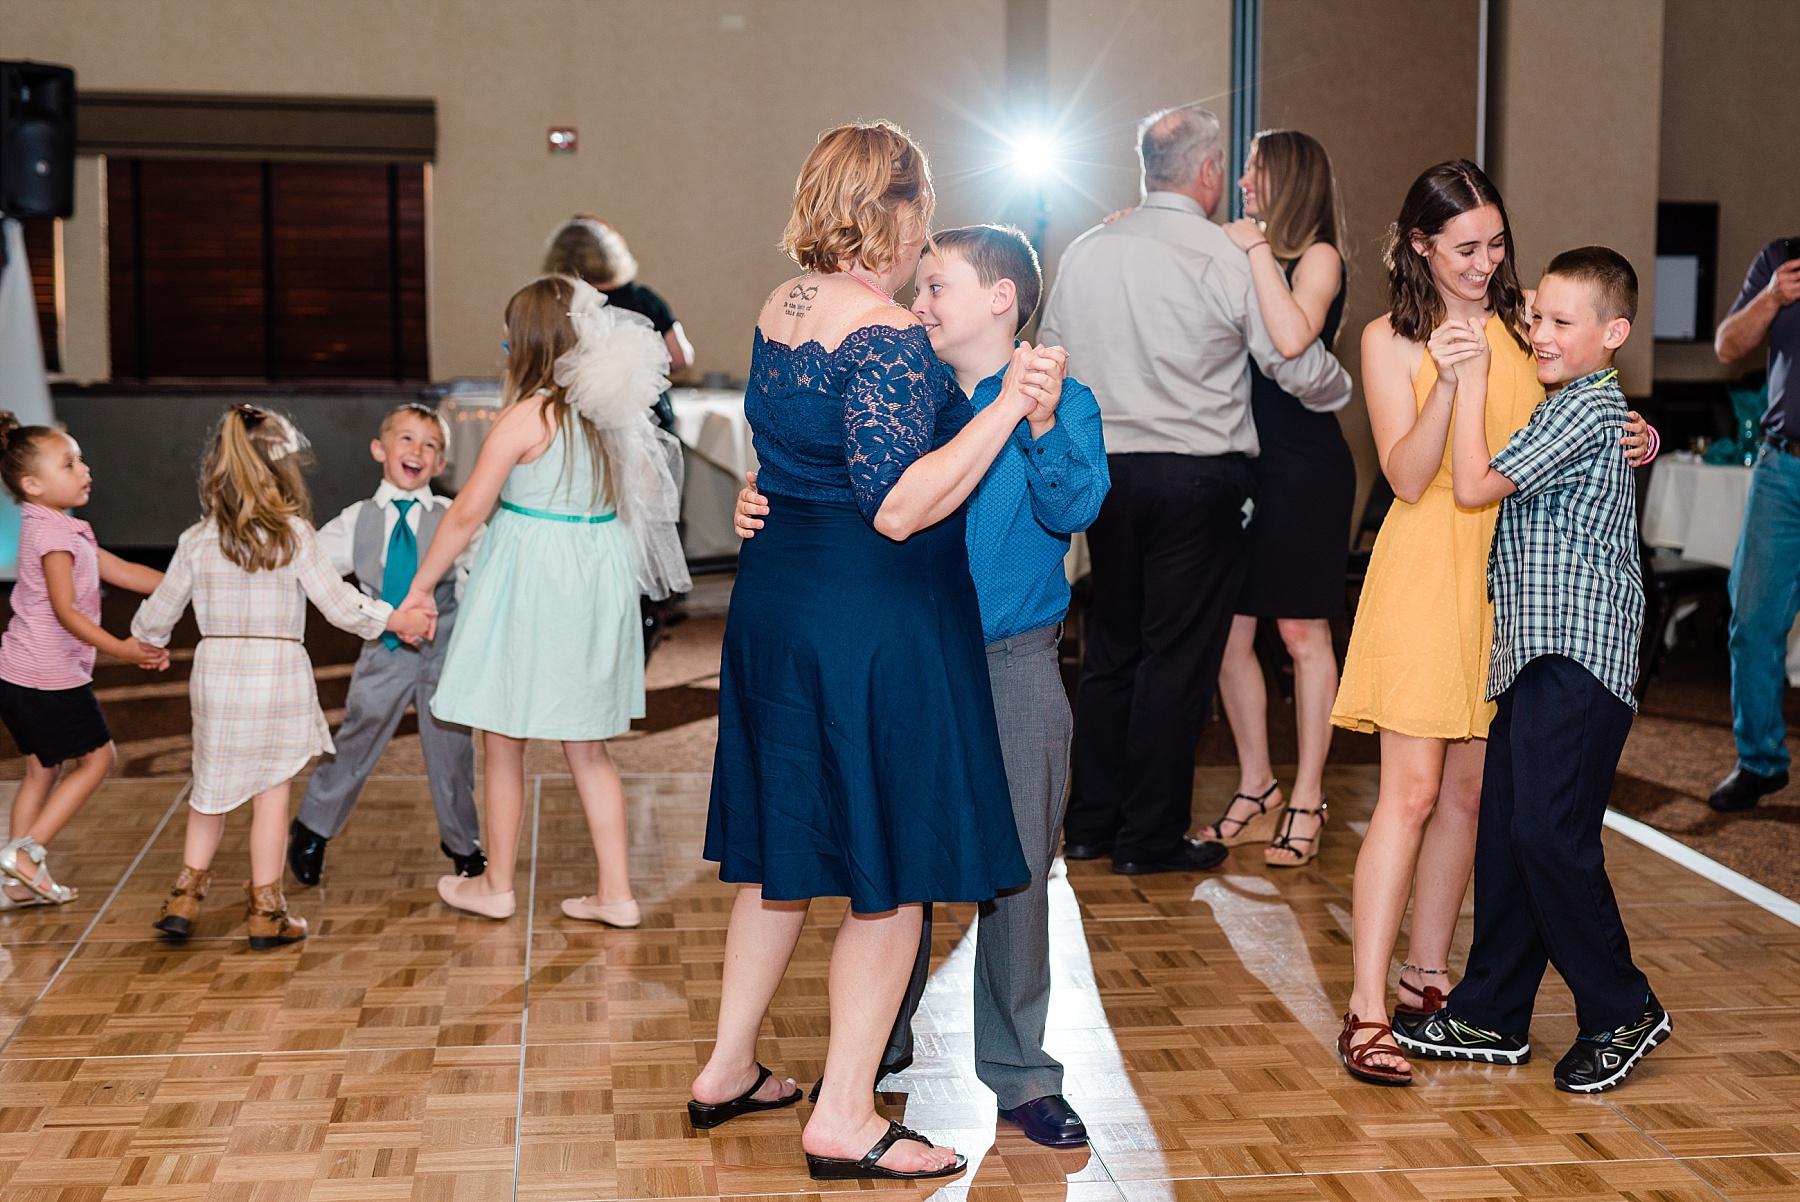 Baurichter Wedding at Stoney Creek Inn Columbia Missouri by Kelsi Kliethermes Photography_0032.jpg